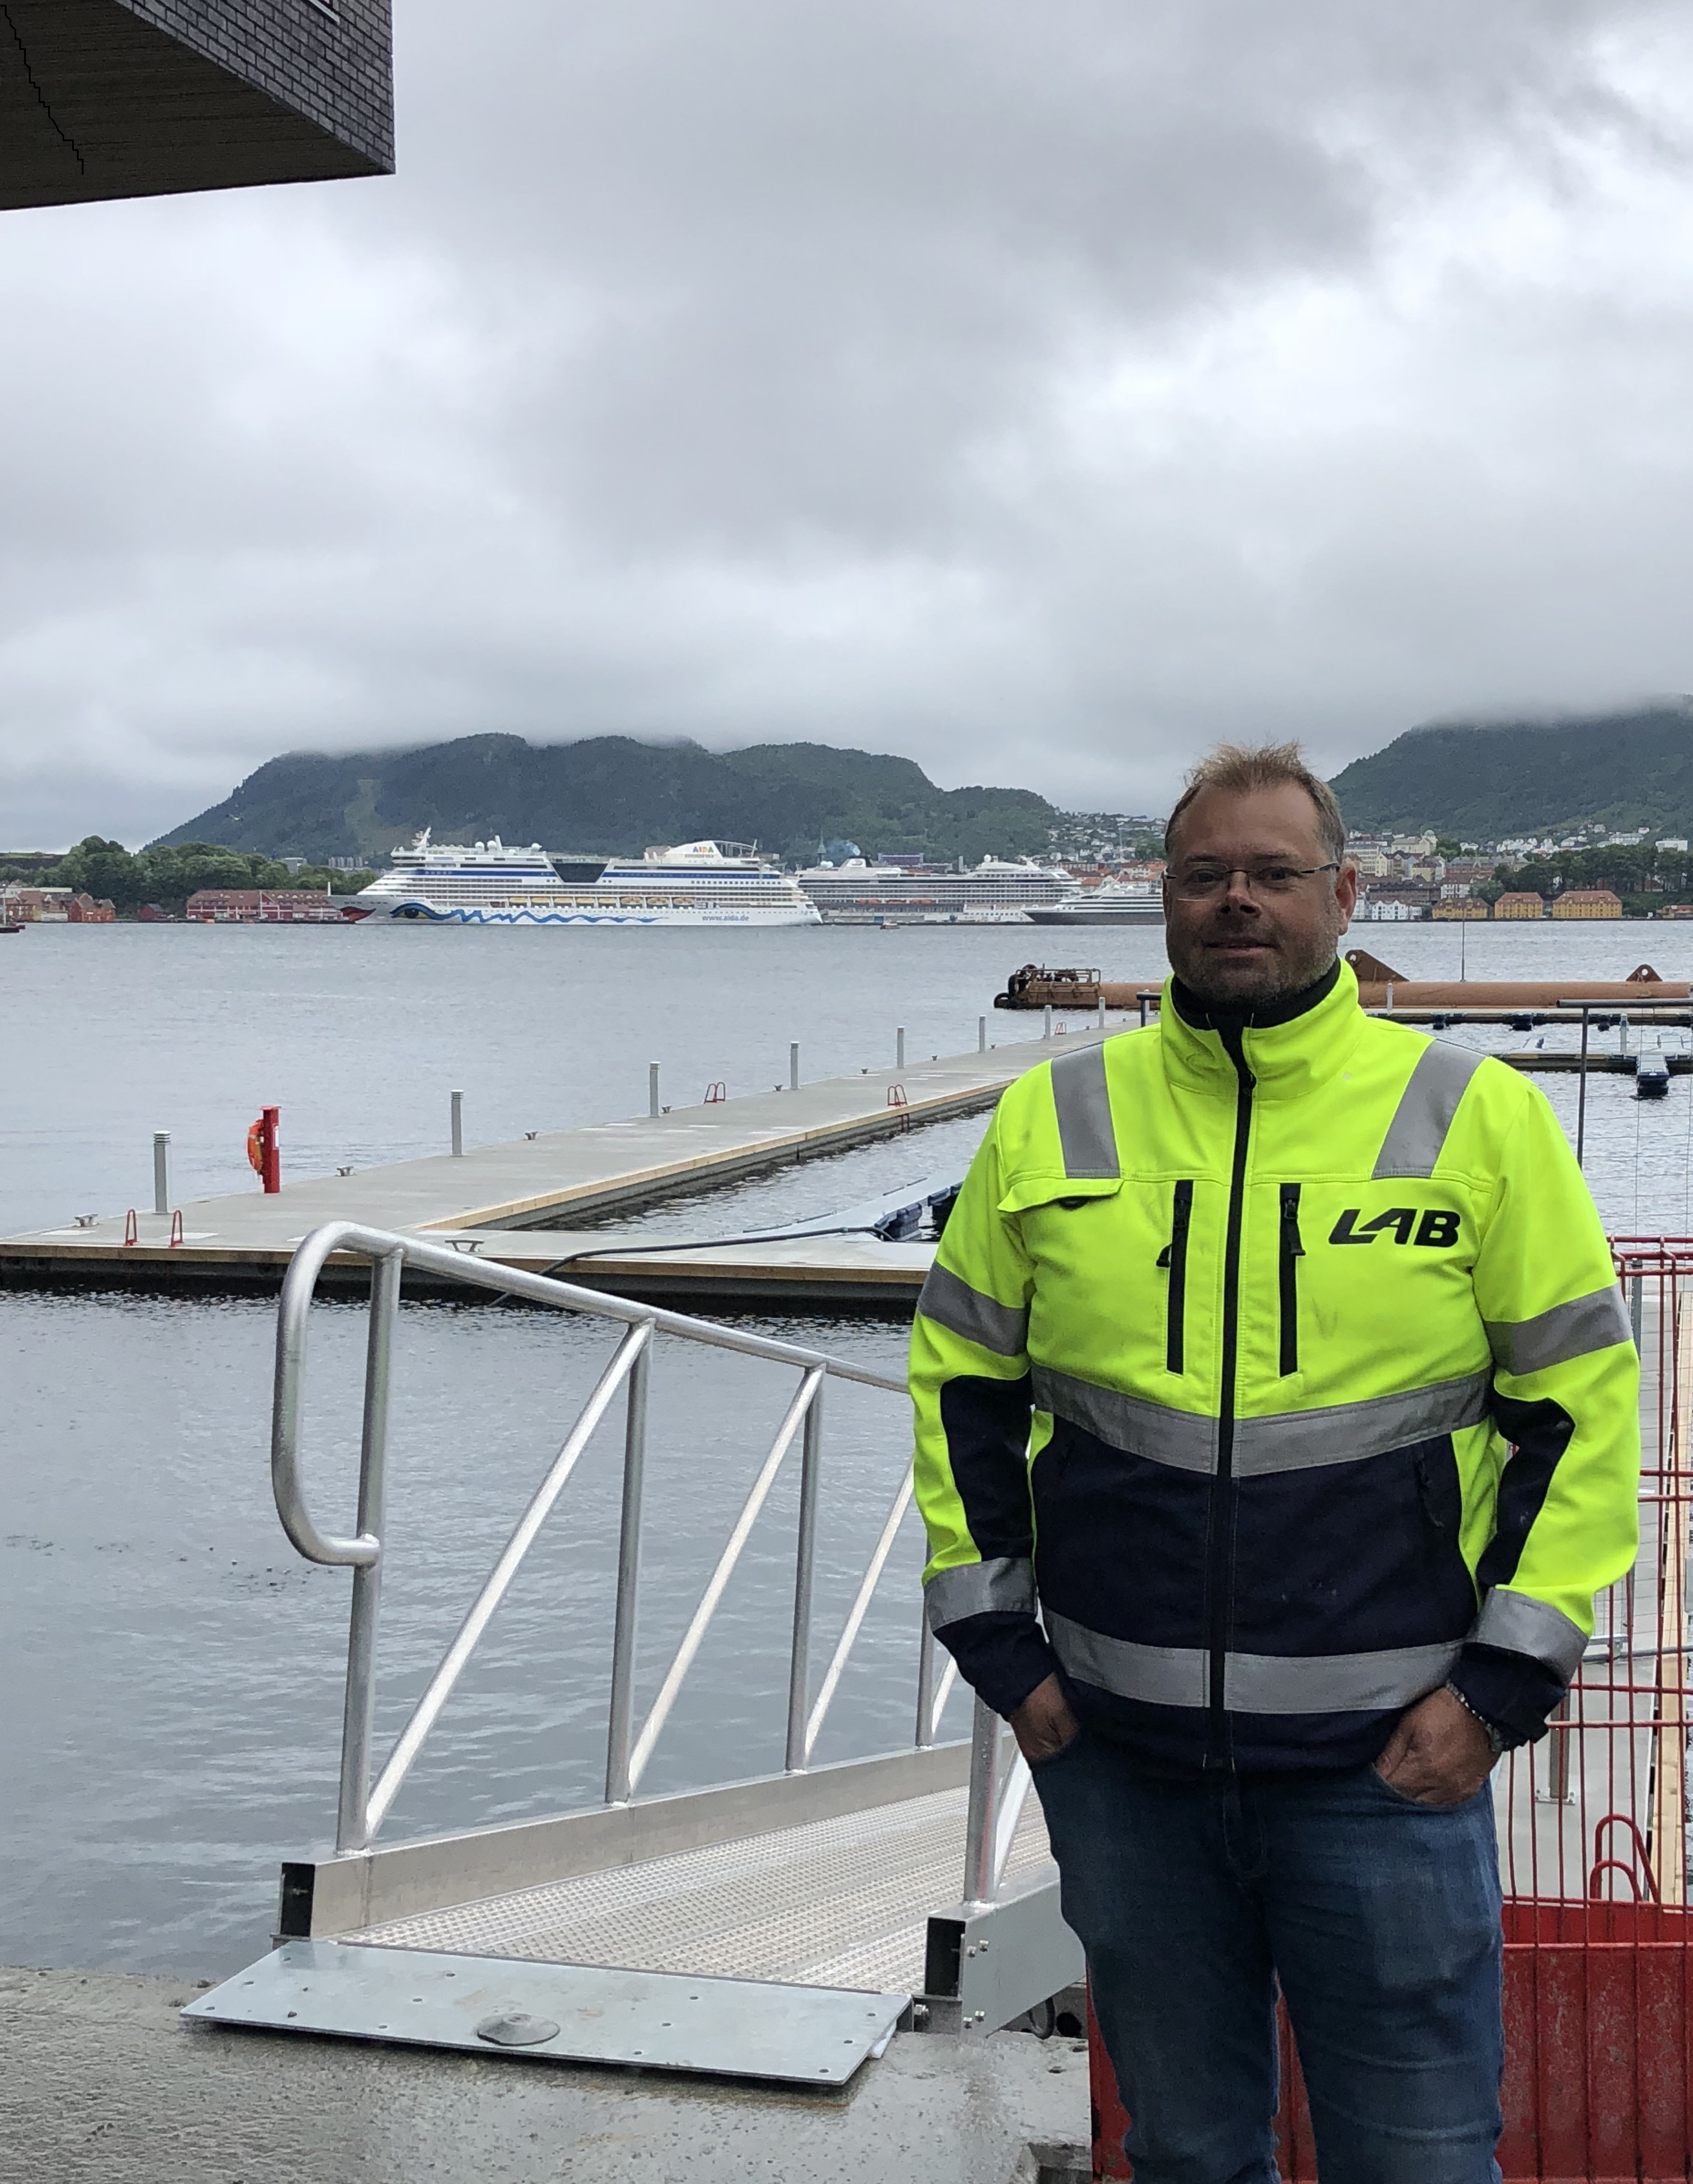 https://www.marinasolutions.no/uploads/overlevering-med-Knut-Helge-Iversen-Byggleder-i-LAB.jpg